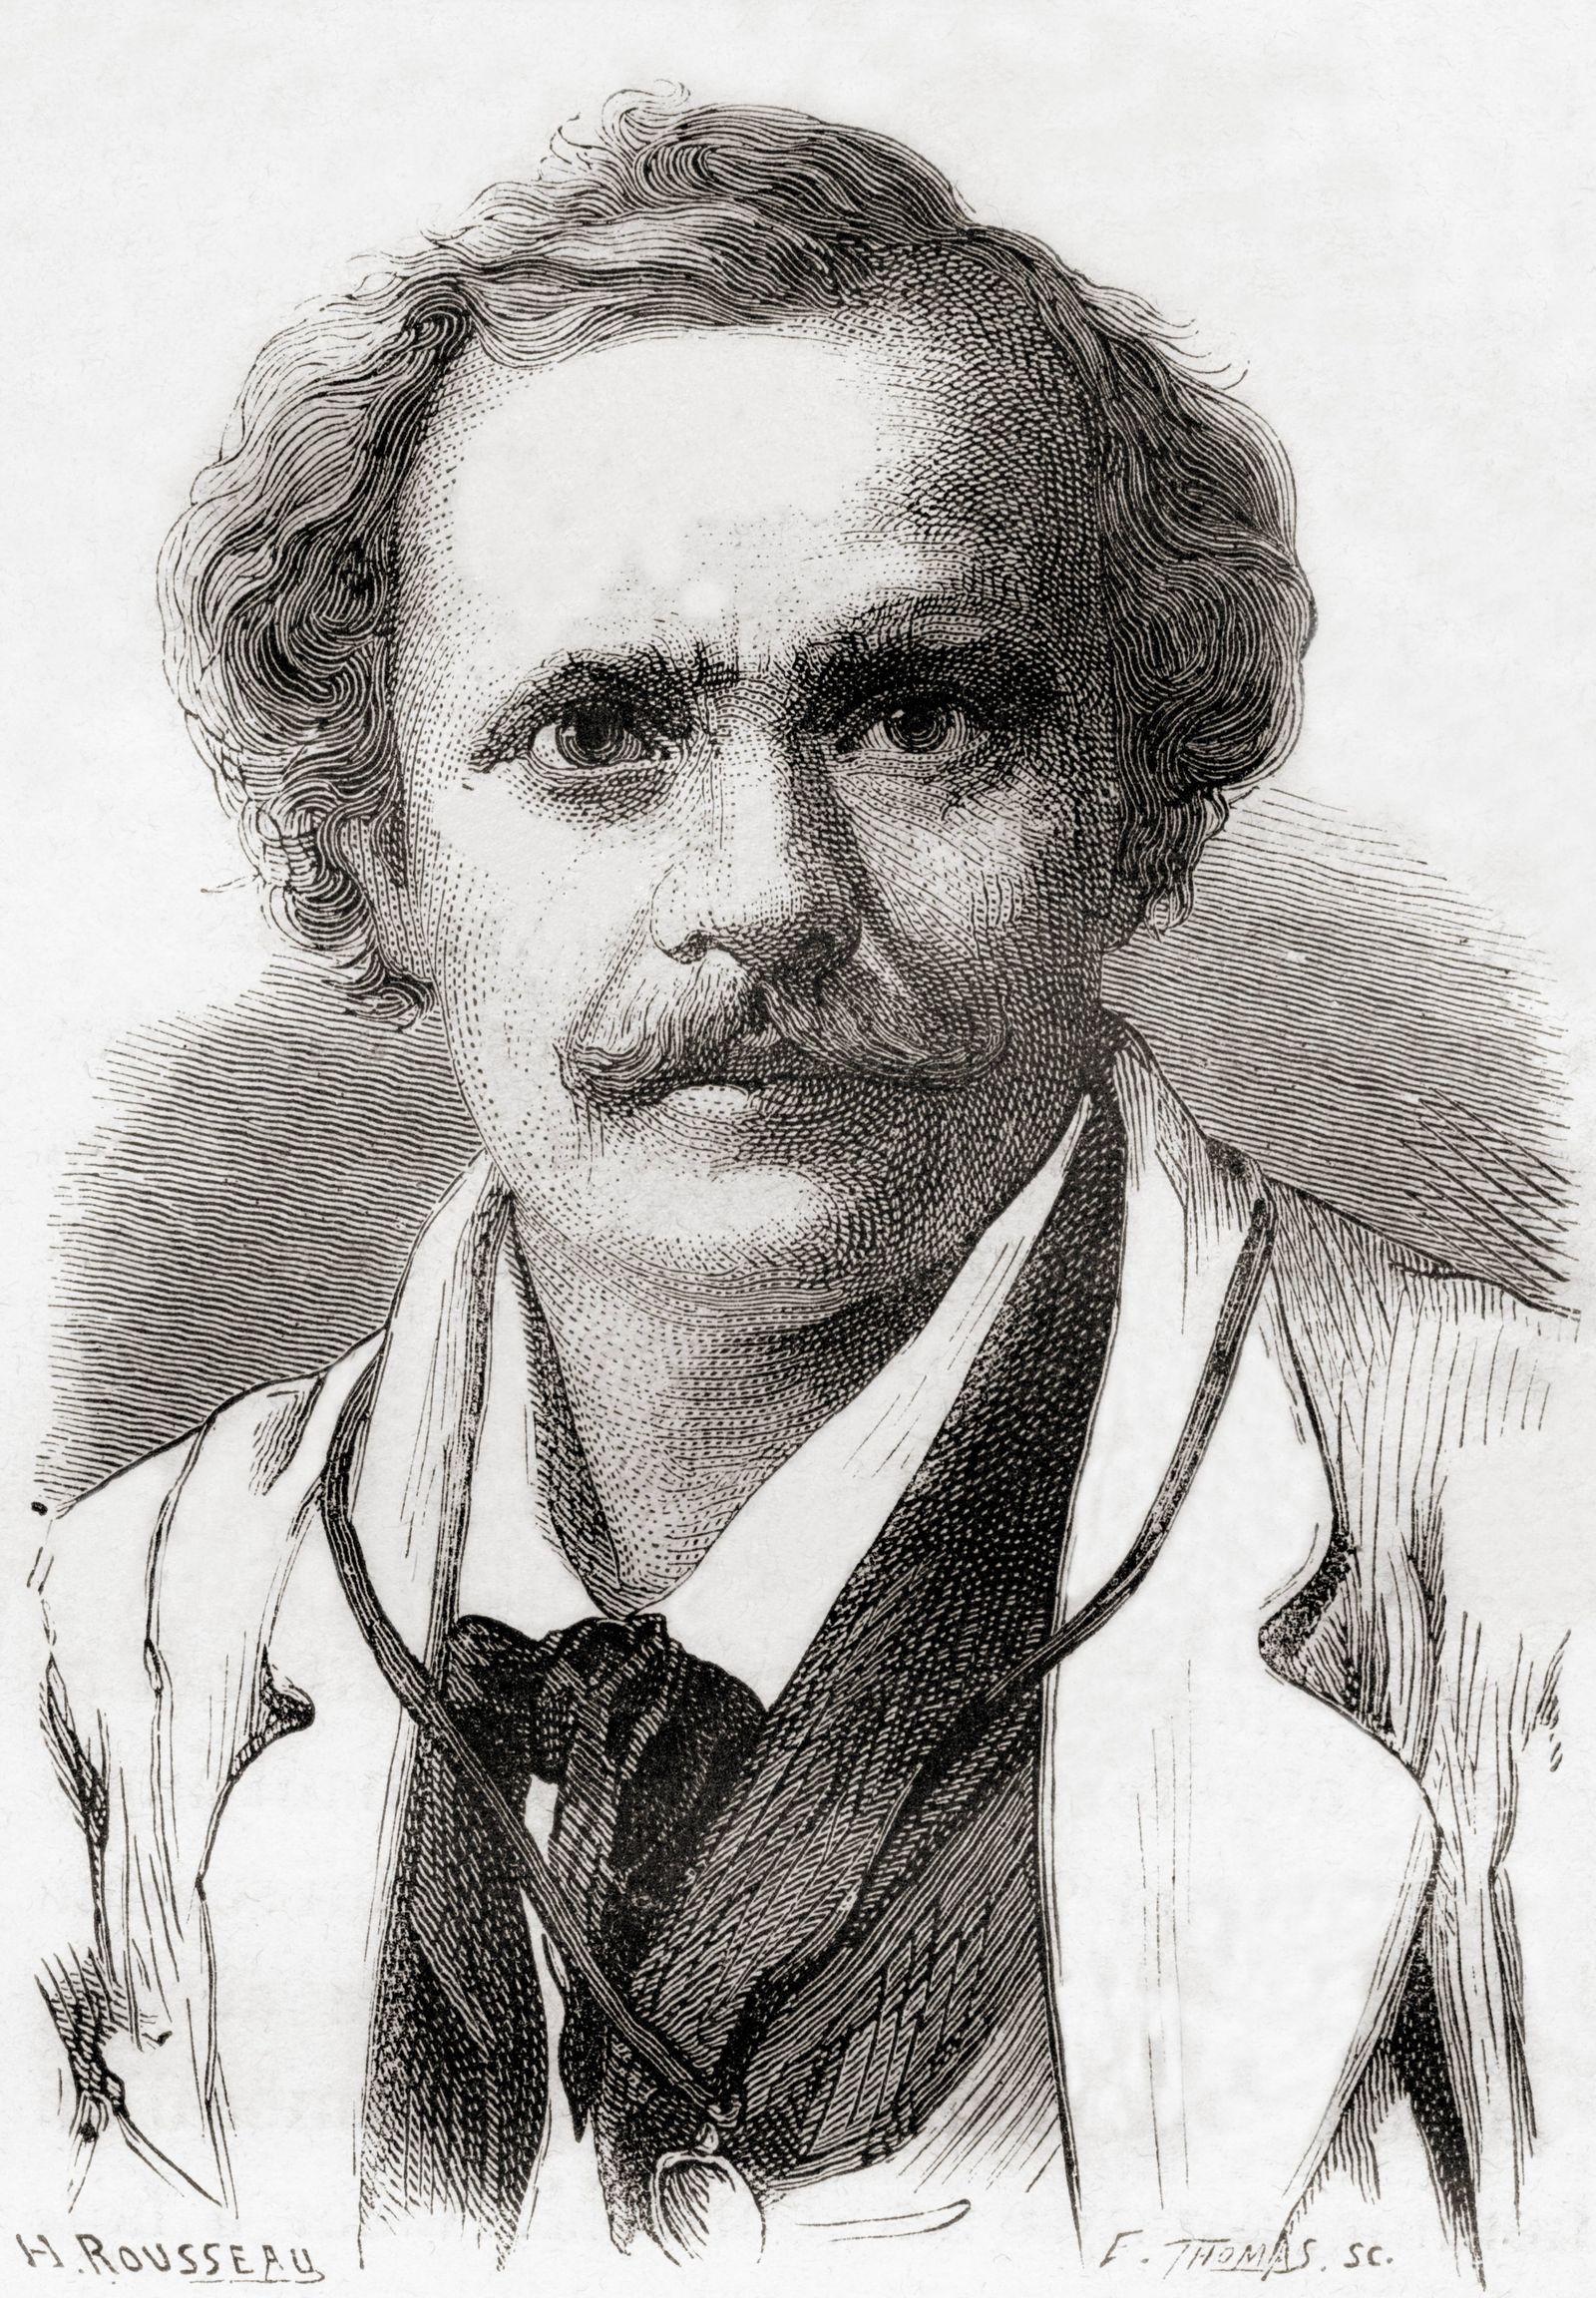 Nadar Was The Pseudonym Of Gaspard Felix Tournachon 1820 1910 French Photographer Caricaturist